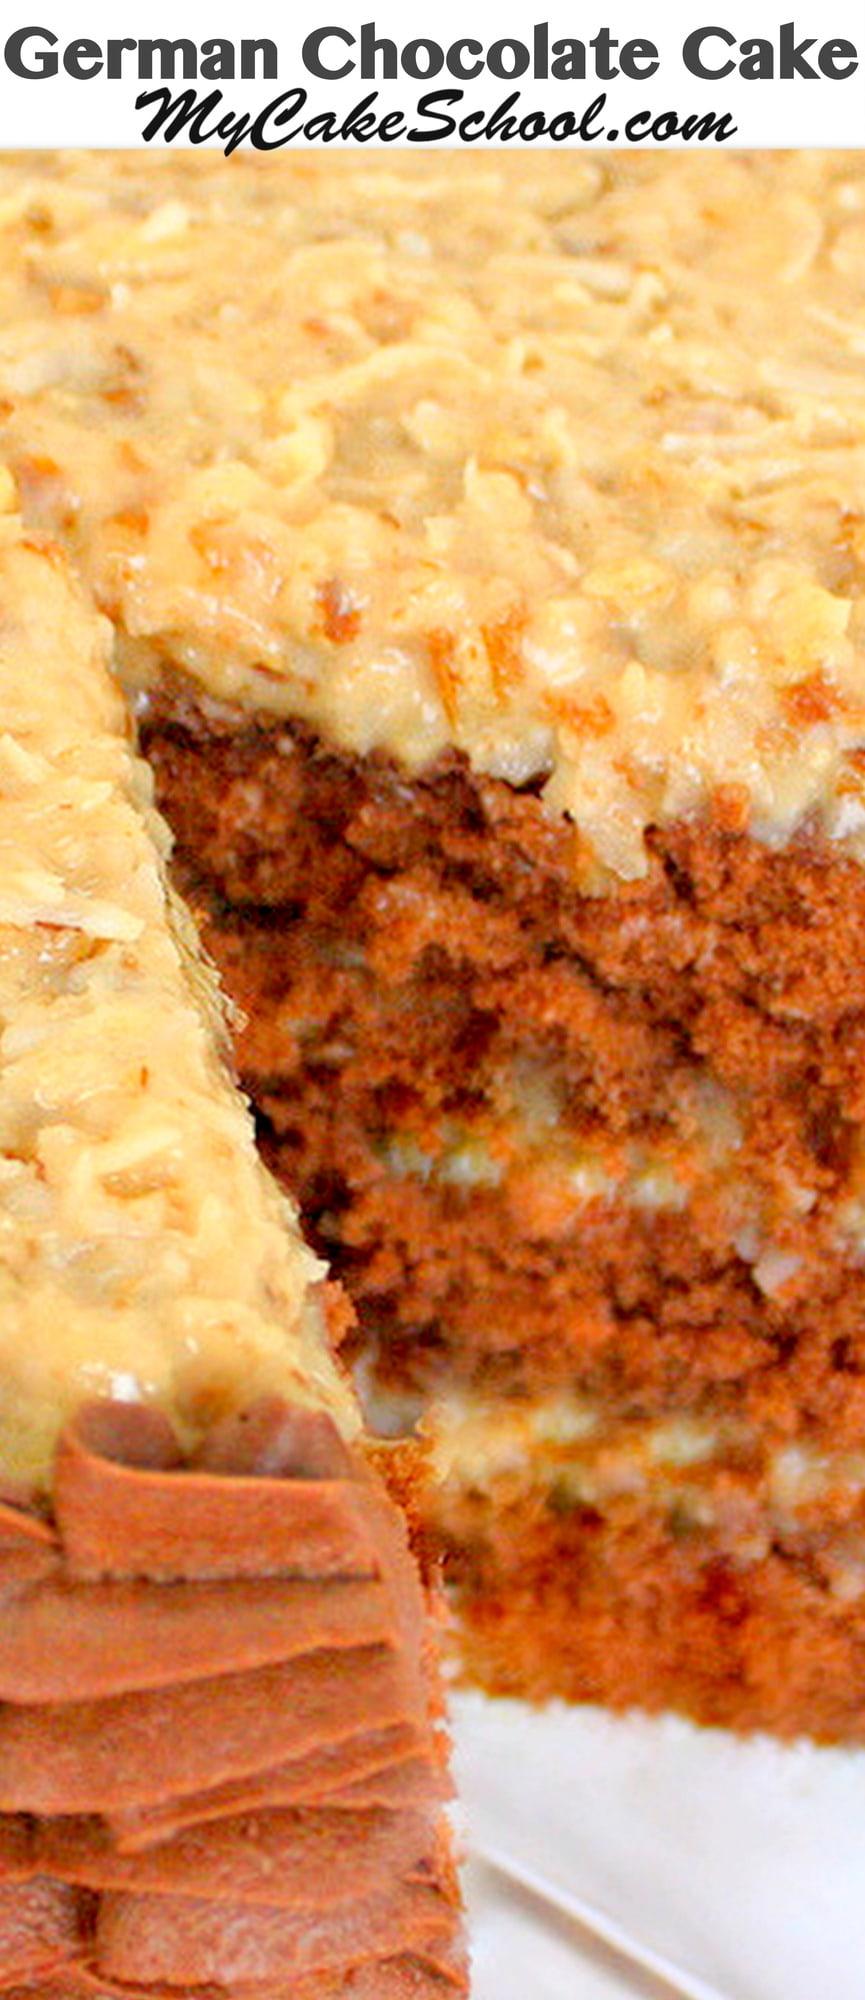 German Chocolate Cake Recipe Scratch My Cake School